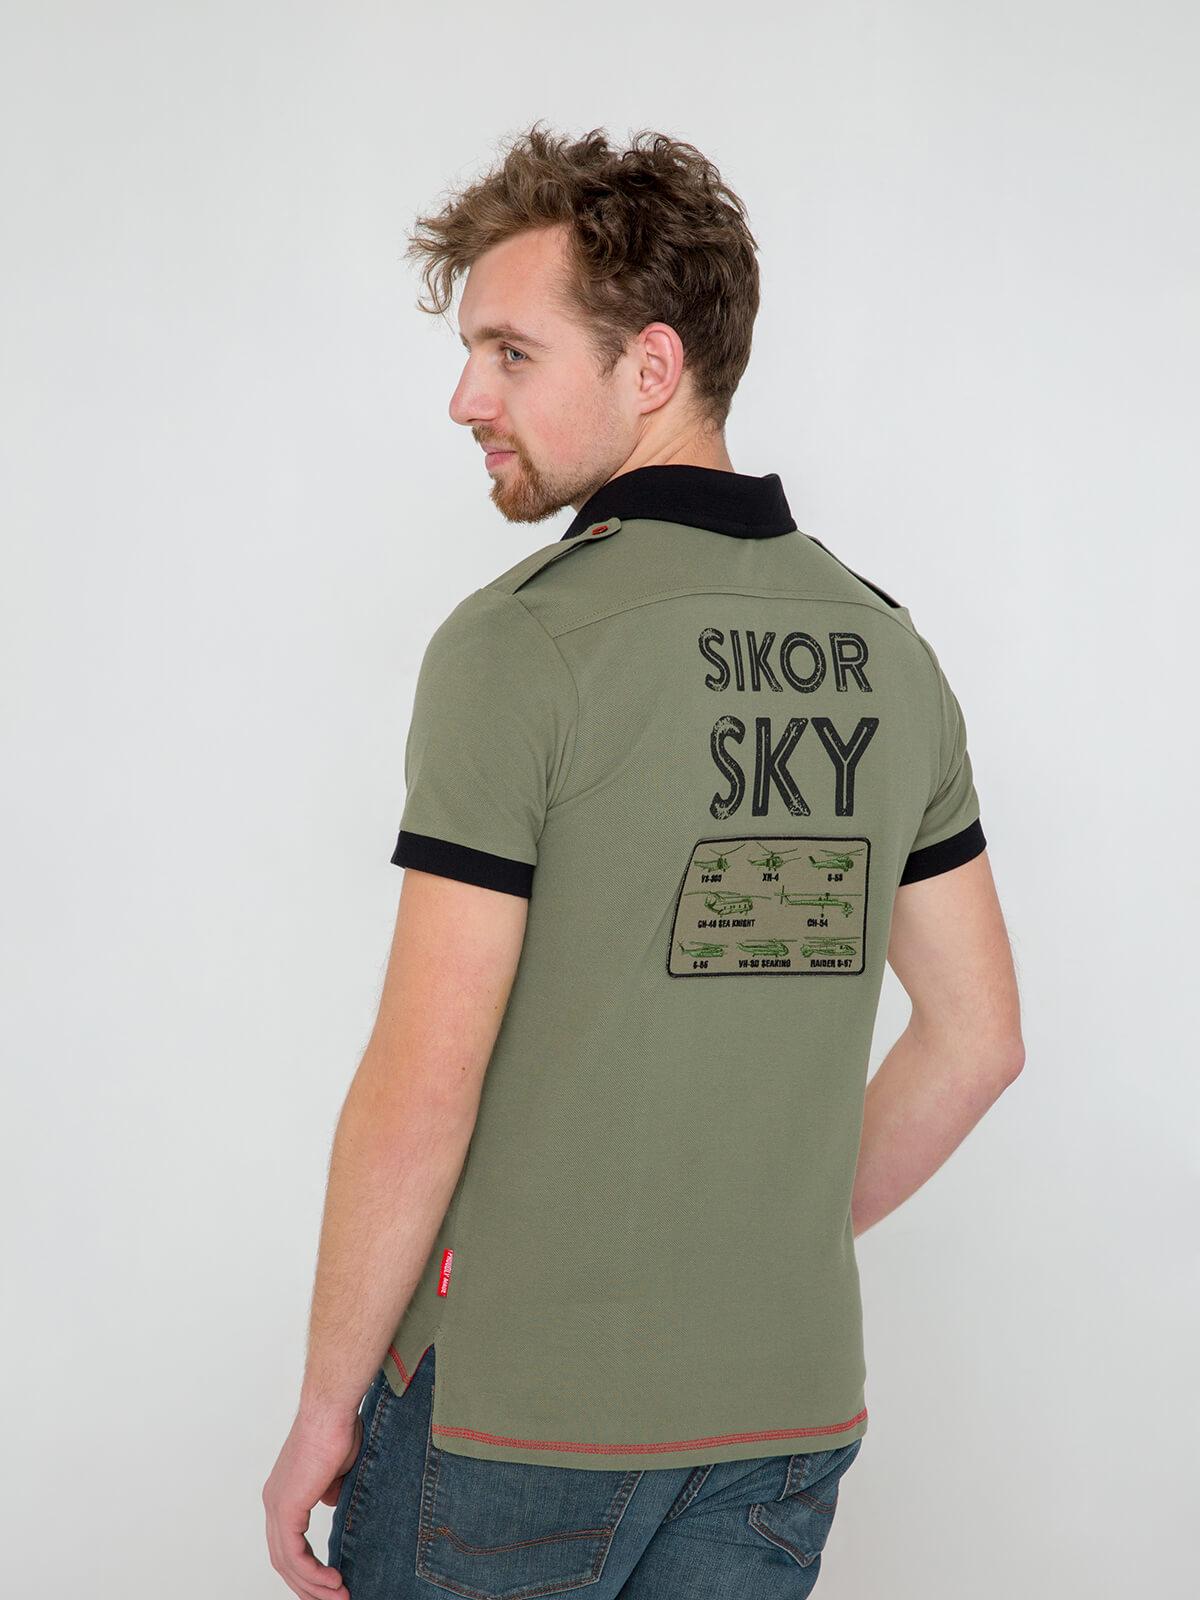 Men's Polo Shirt Sikorsky. Color khaki.  Technique of prints applied: embroidery, silkscreen printing, chevron.